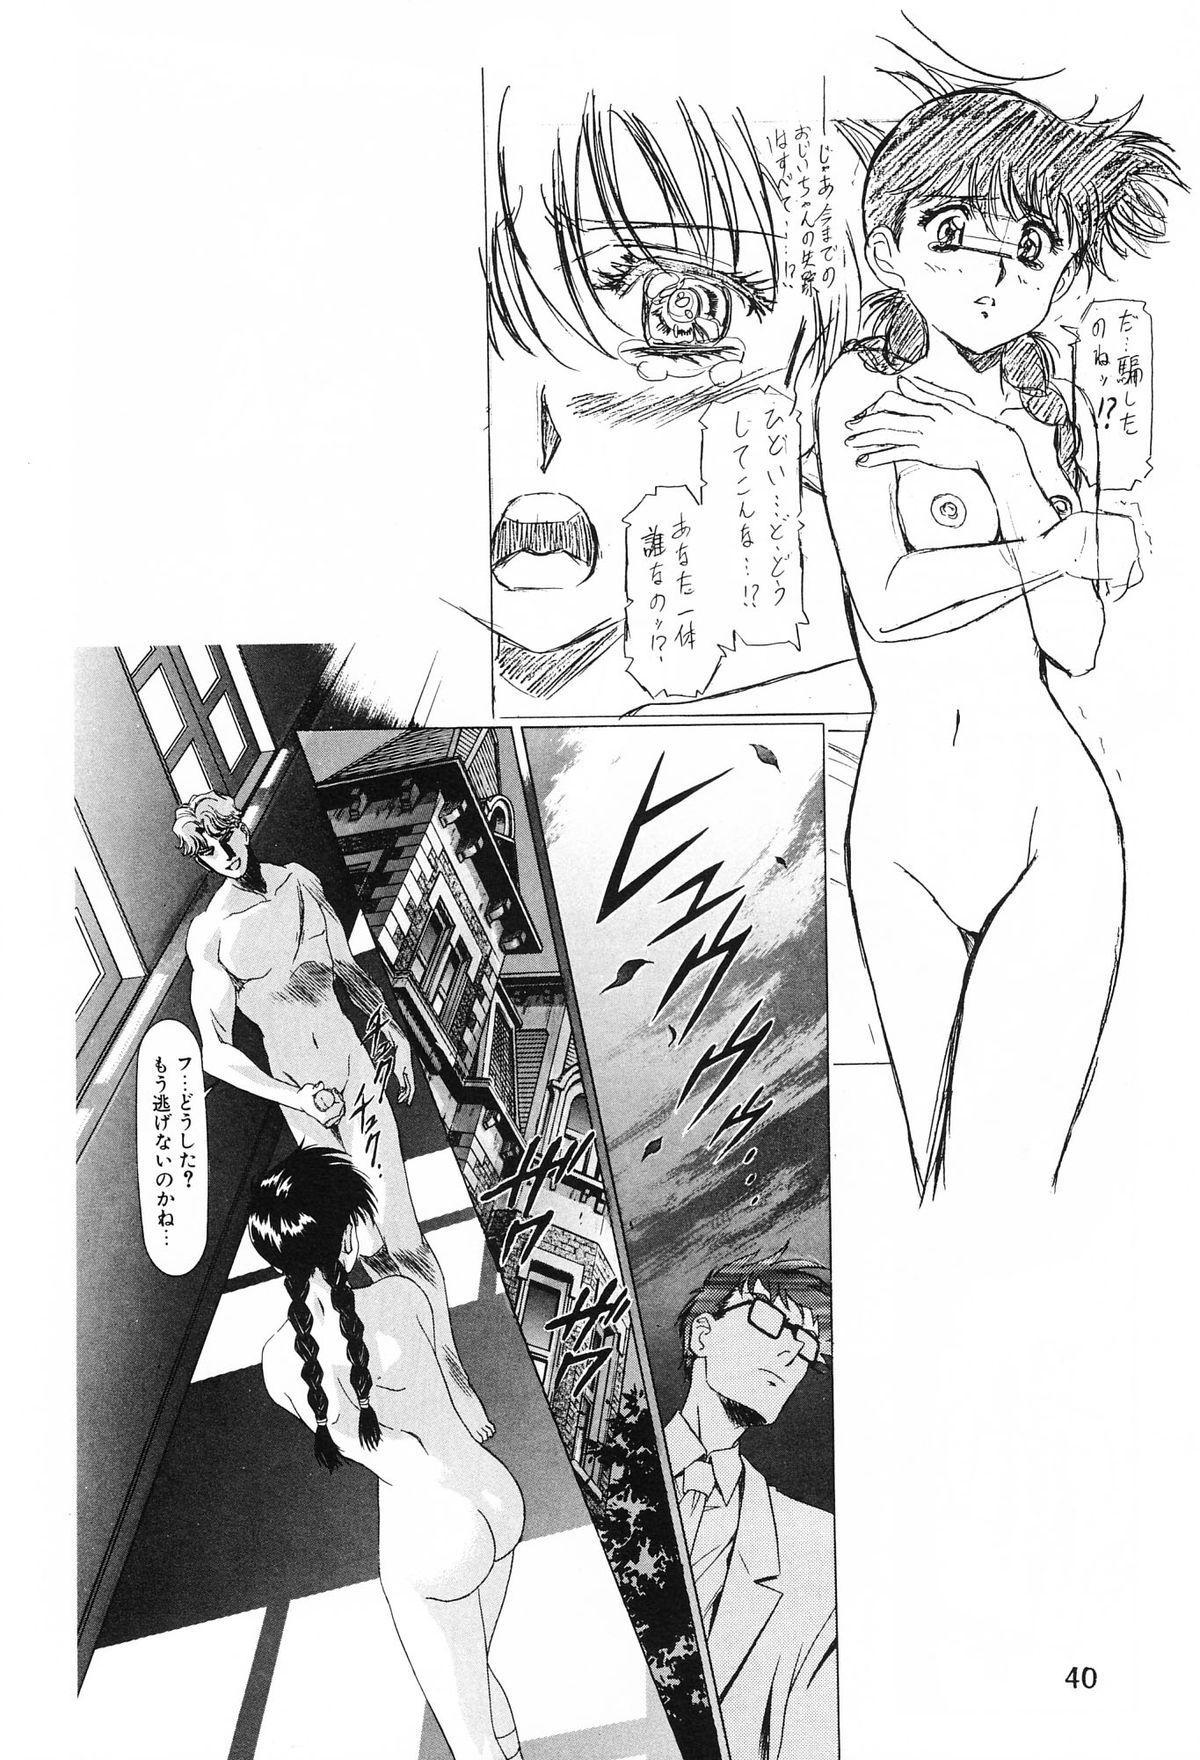 Henrei-kai '98 Natsu SPECIAL 41